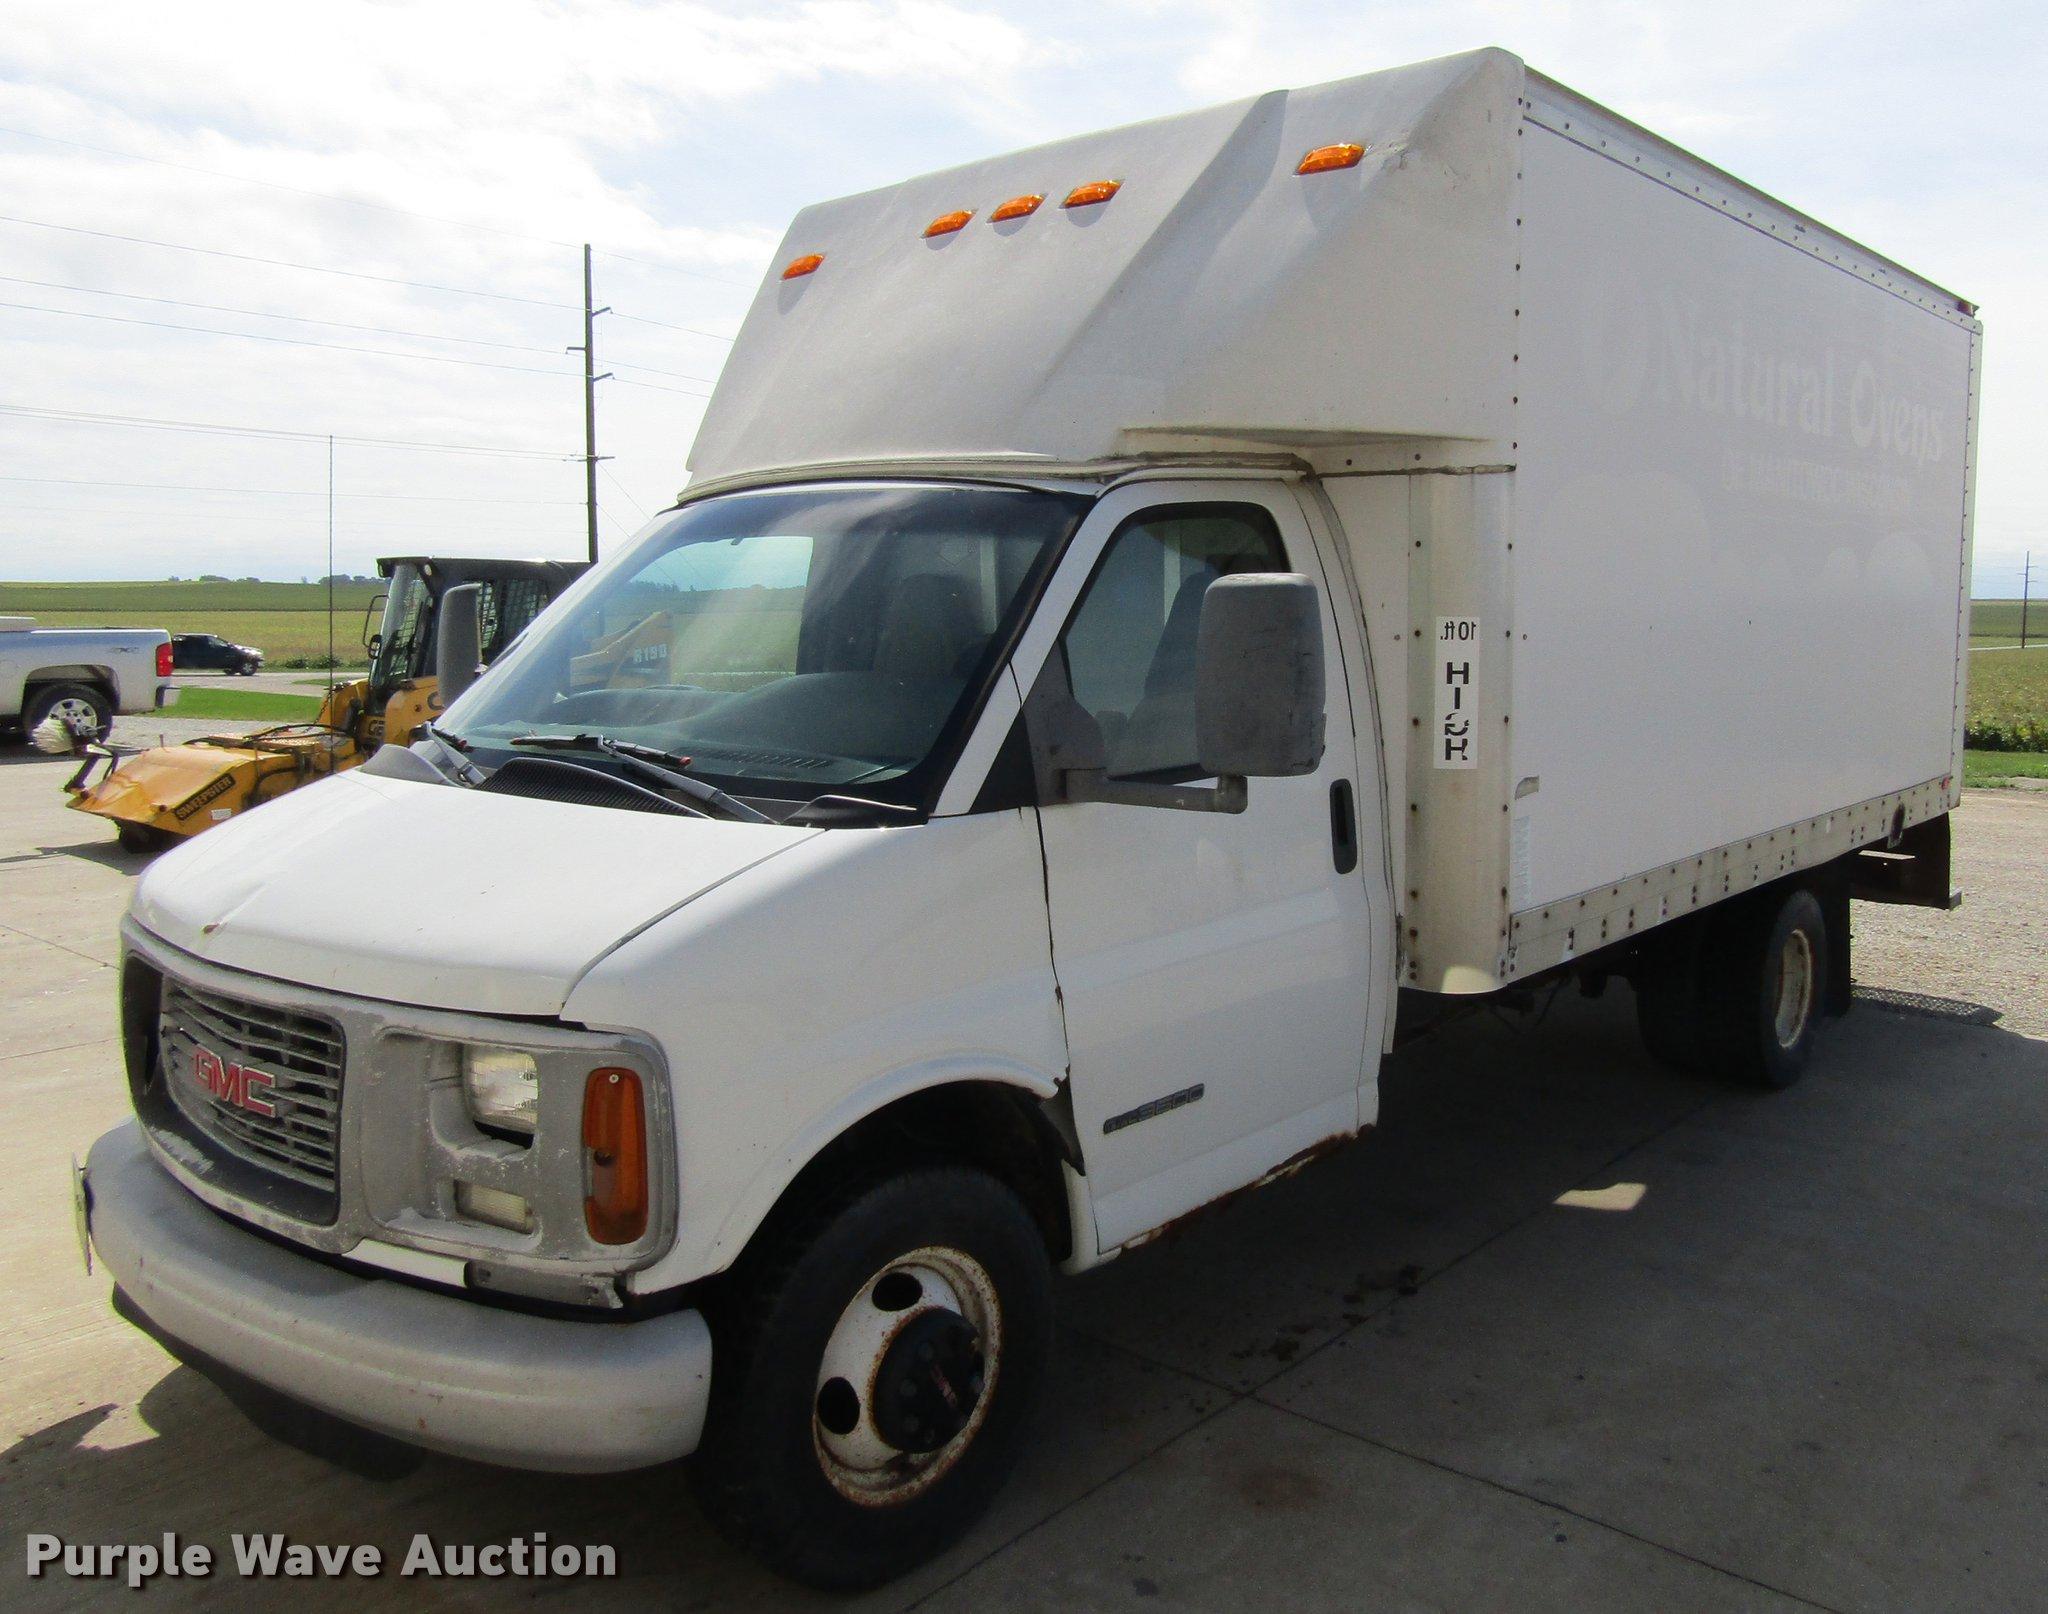 2001 gmc savana g3500 cargo box truck in waterloo ia item df3853 sold purple wave 2001 gmc savana g3500 cargo box truck